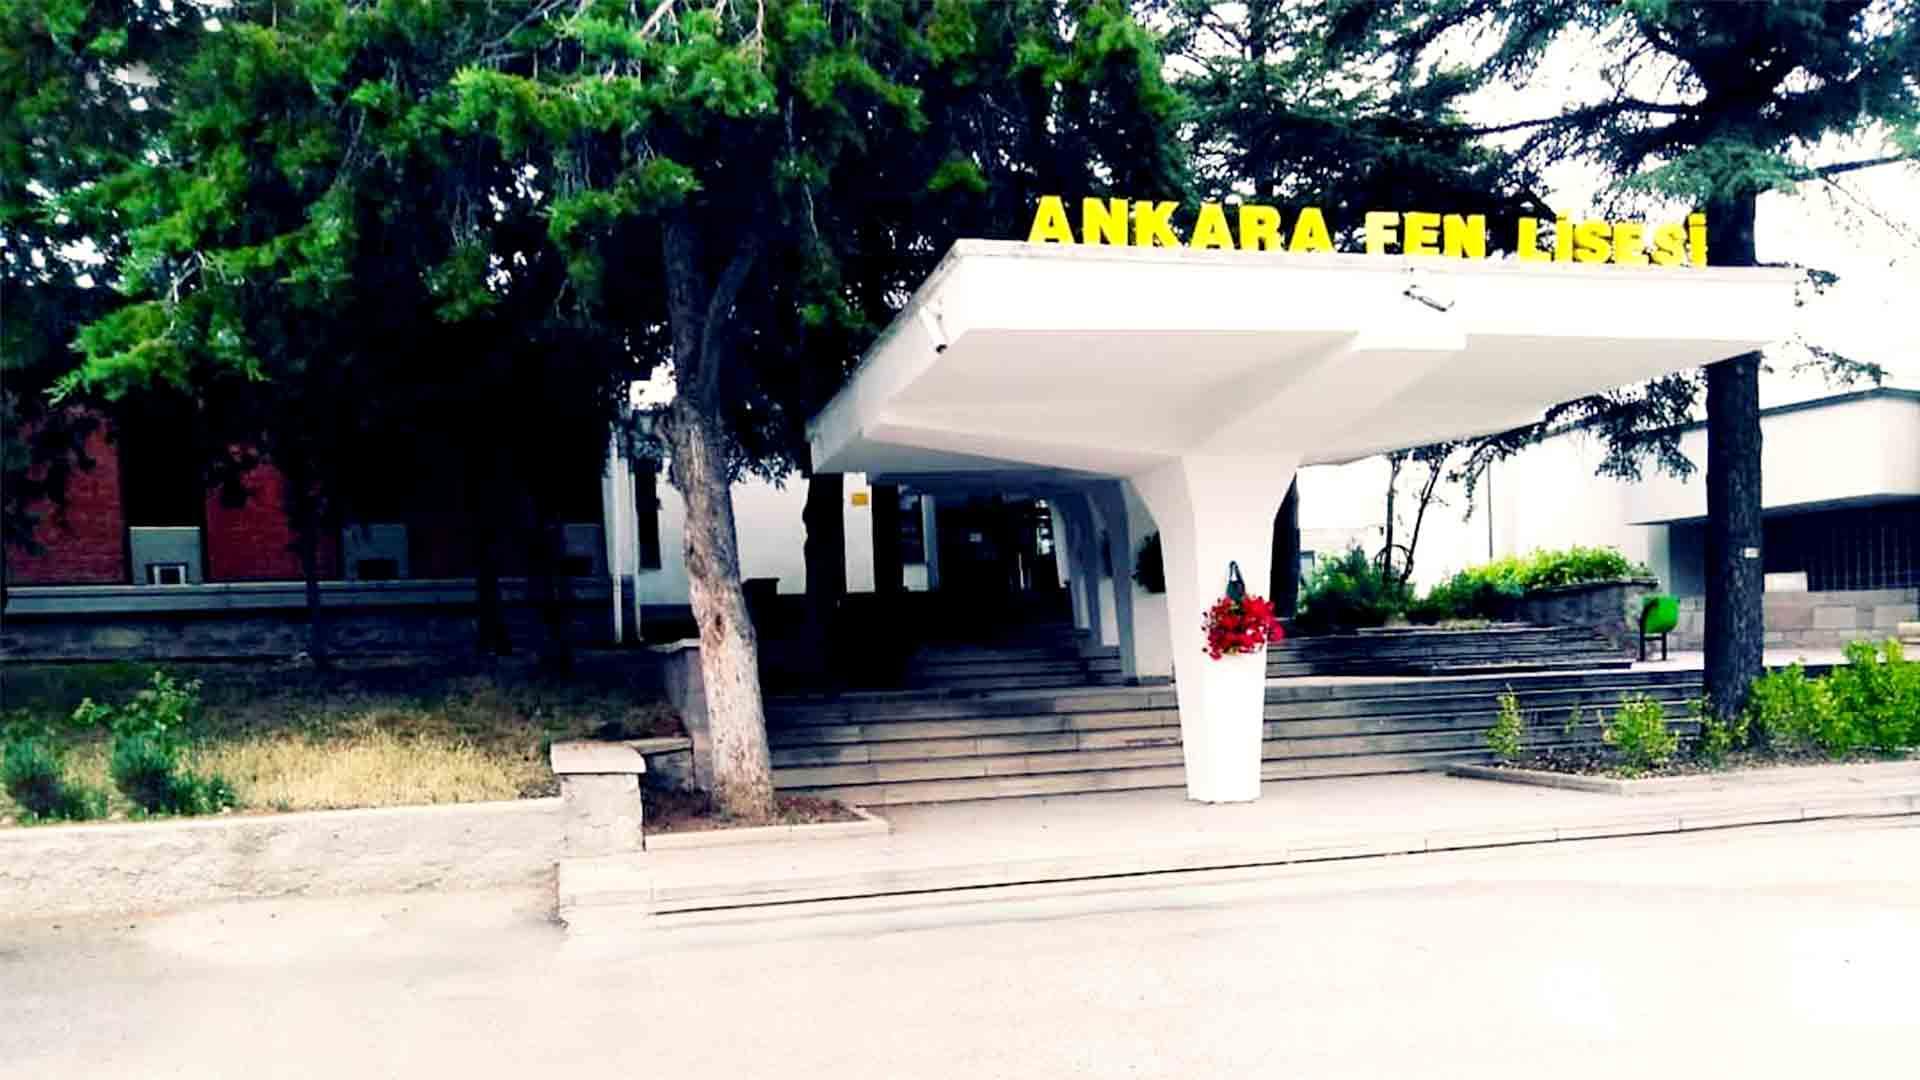 Ankara'nın En İyi Liseleri Sıralaması?fit=thumb&w=418&h=152&q=80